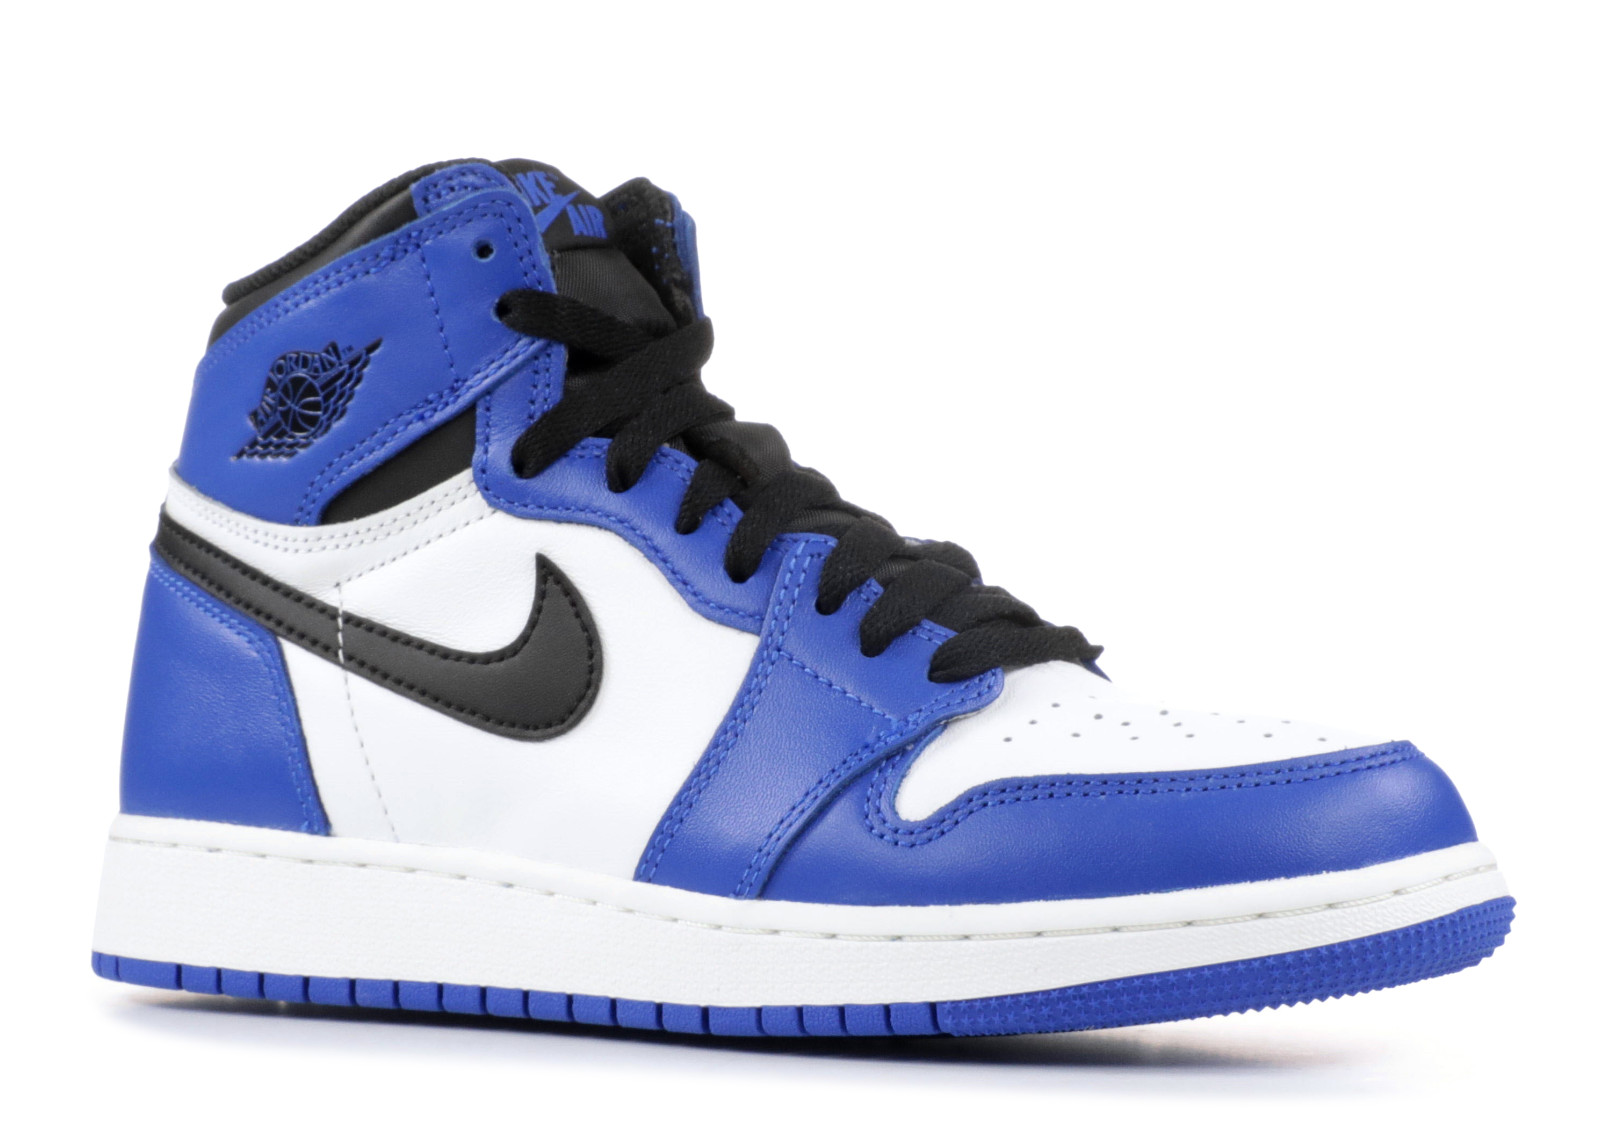 finest selection 4bb4a 22f69 Air Jordan - Unisex - Air Jordan 1 Retro High Og Bg (Gs)  Game Royal  -  575441-403 - Size 7Y